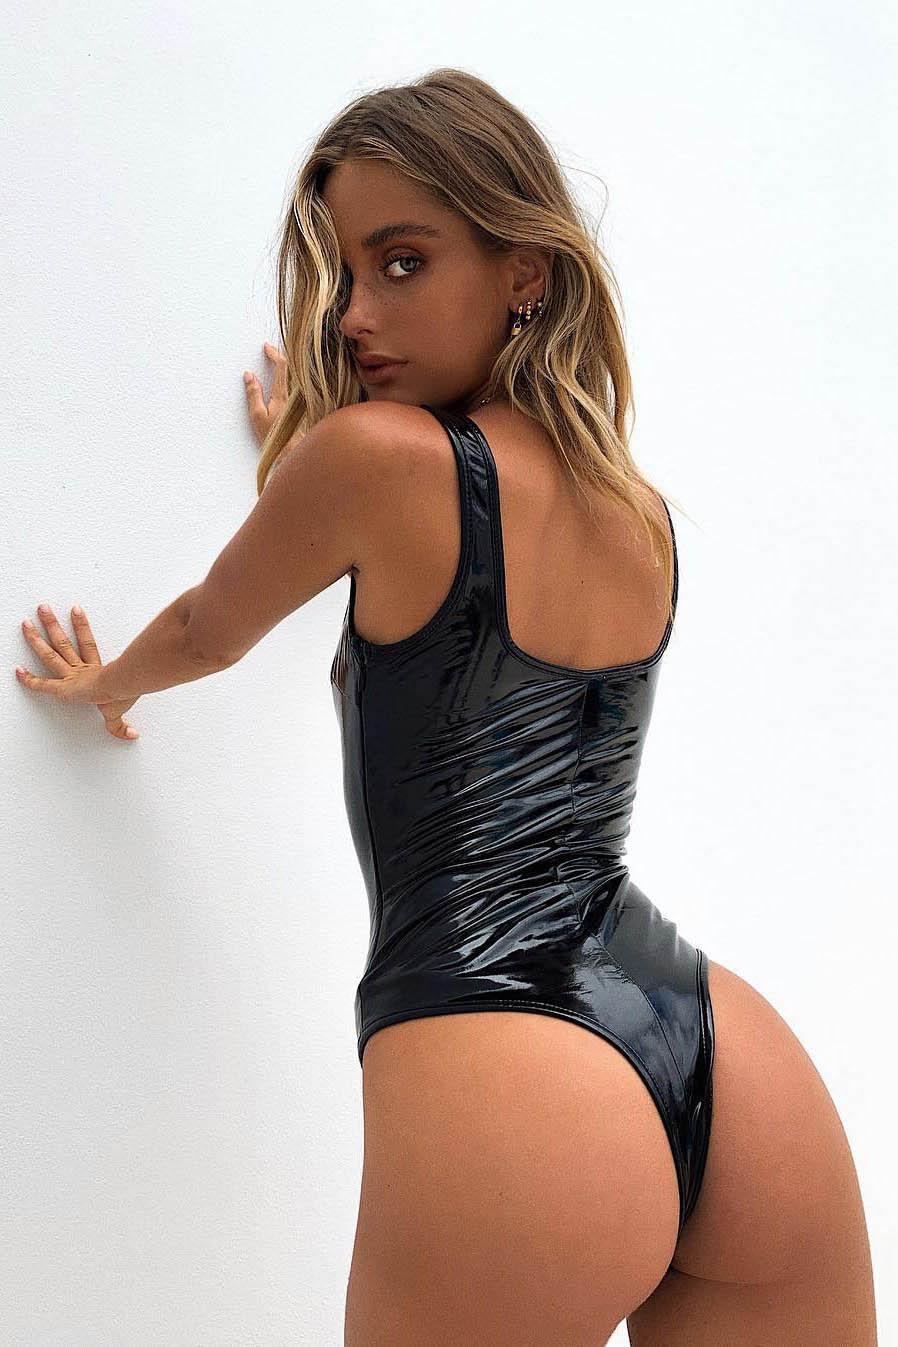 Blonde Natasha